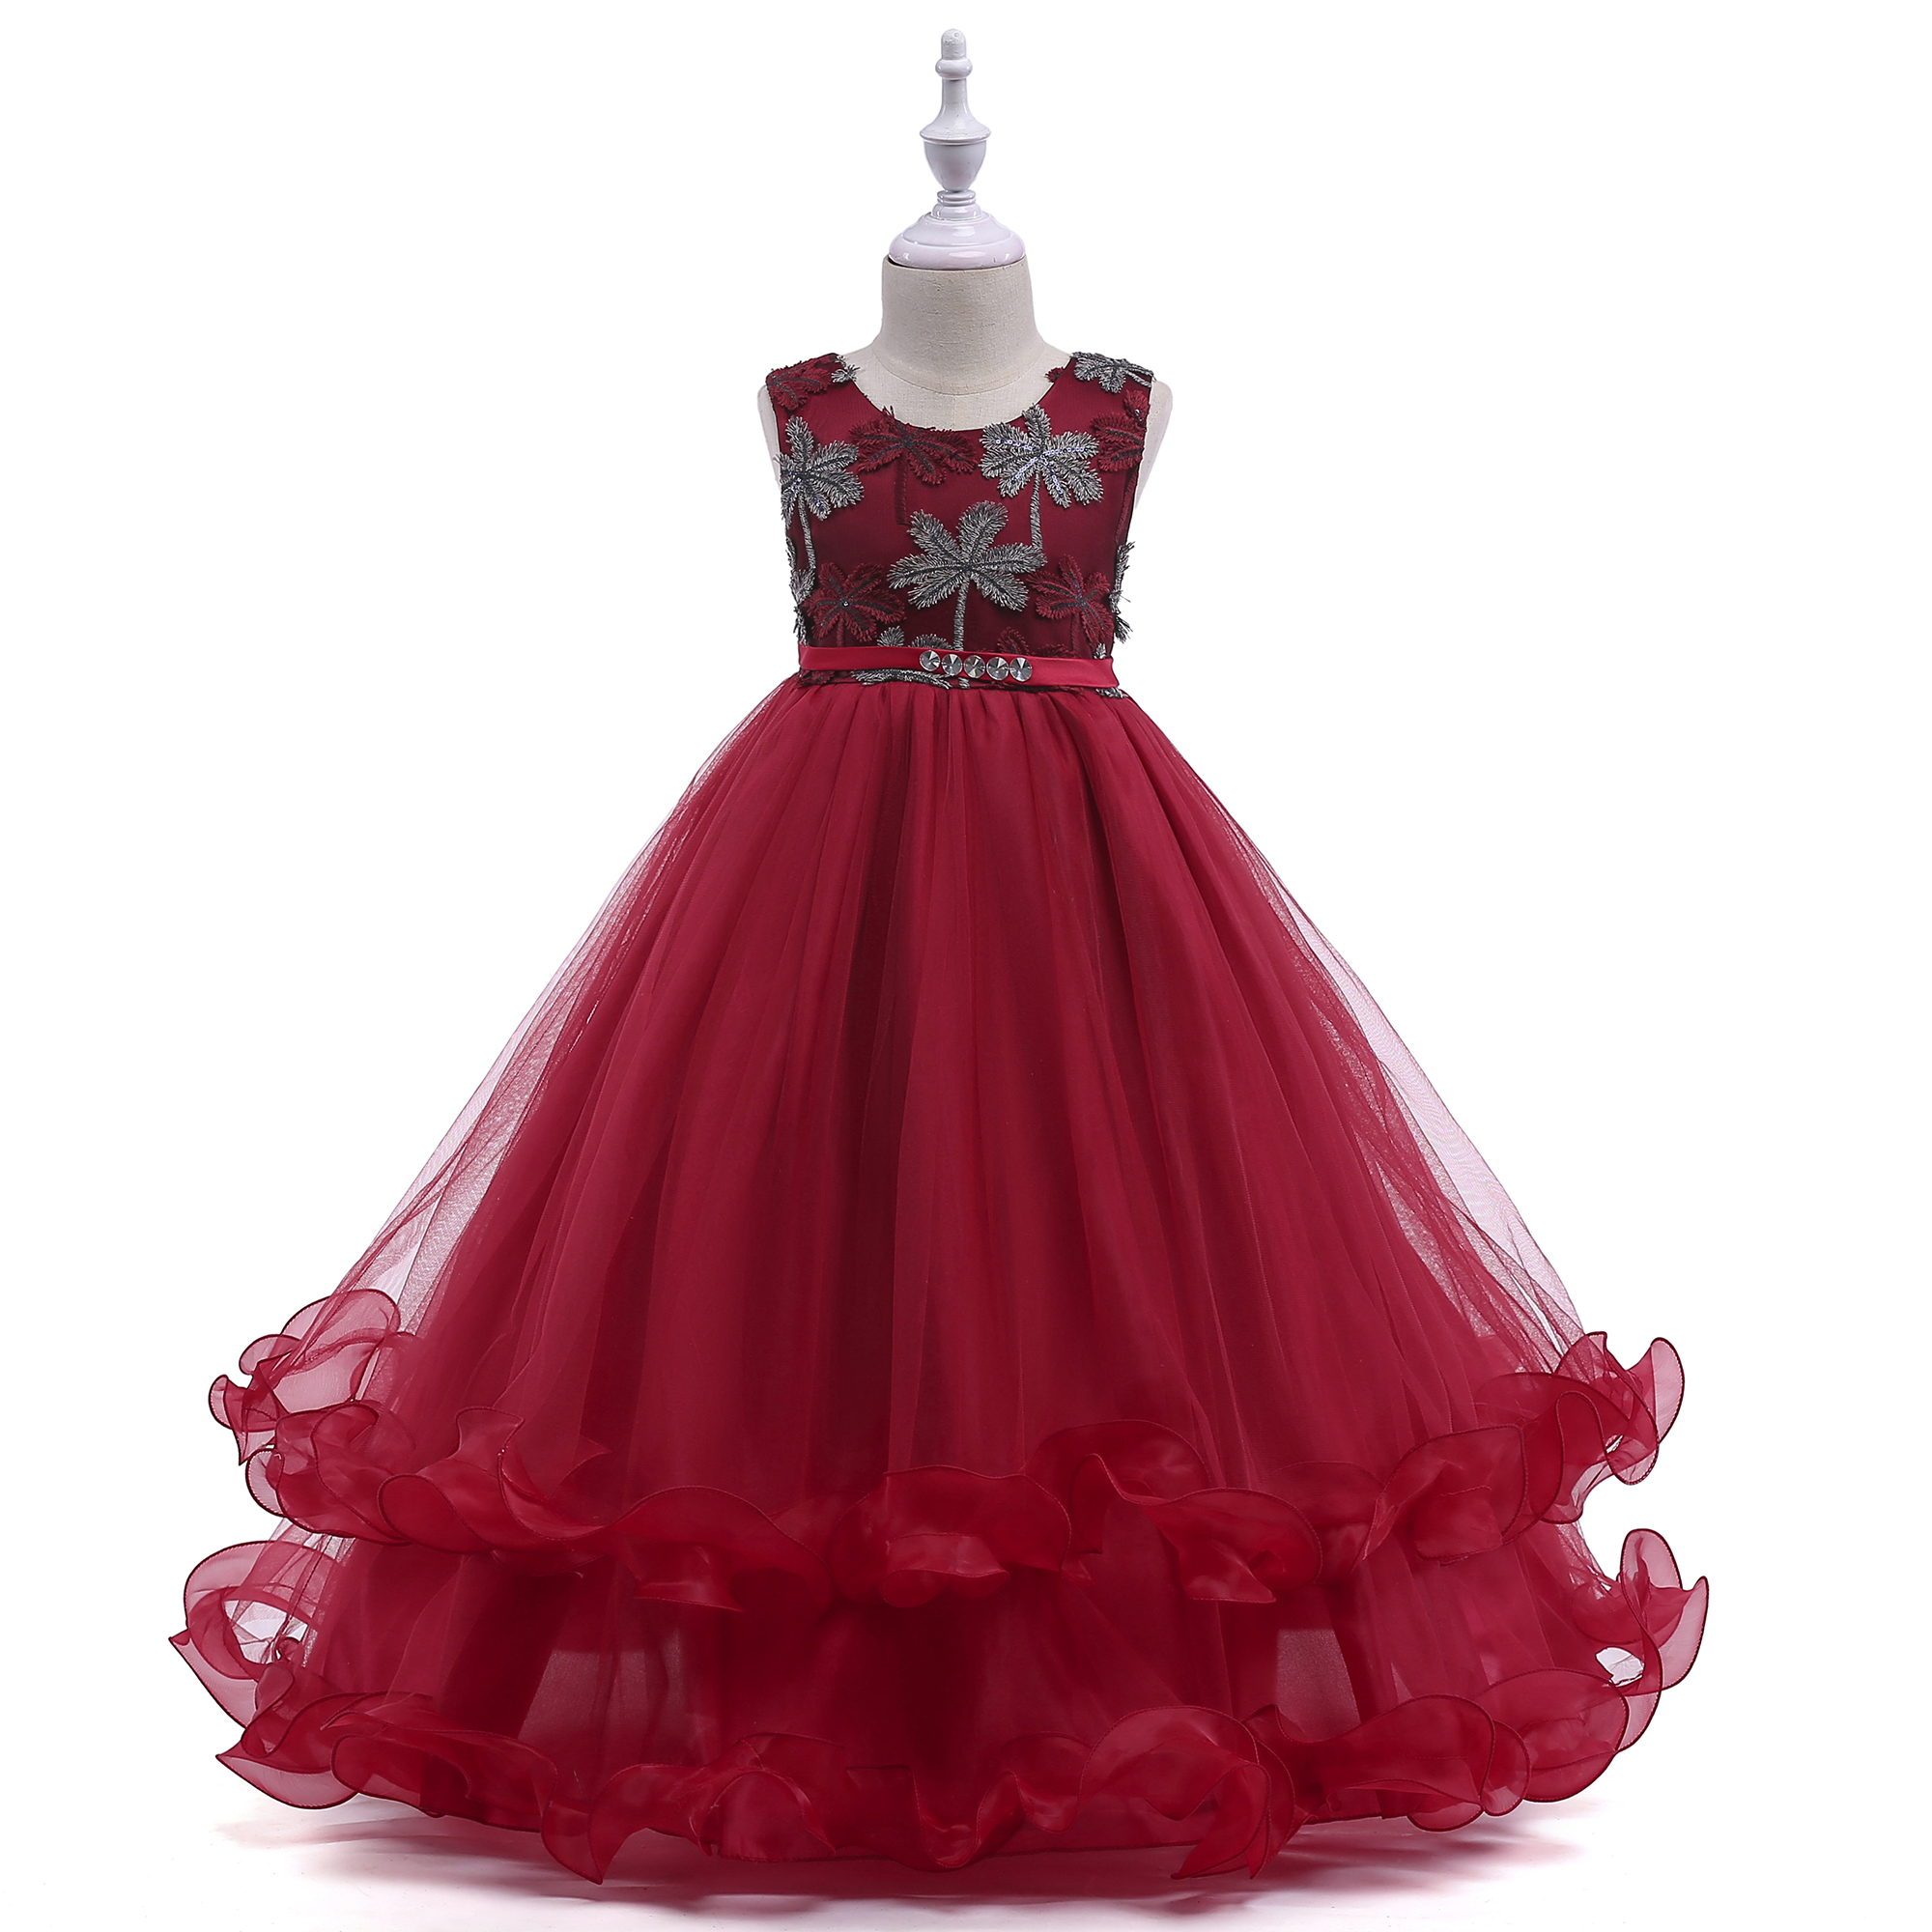 1f727576d01 Baby Girl Party Children Frocks Designs Flower Wedding Dress INF30 - Inayah  Fashion